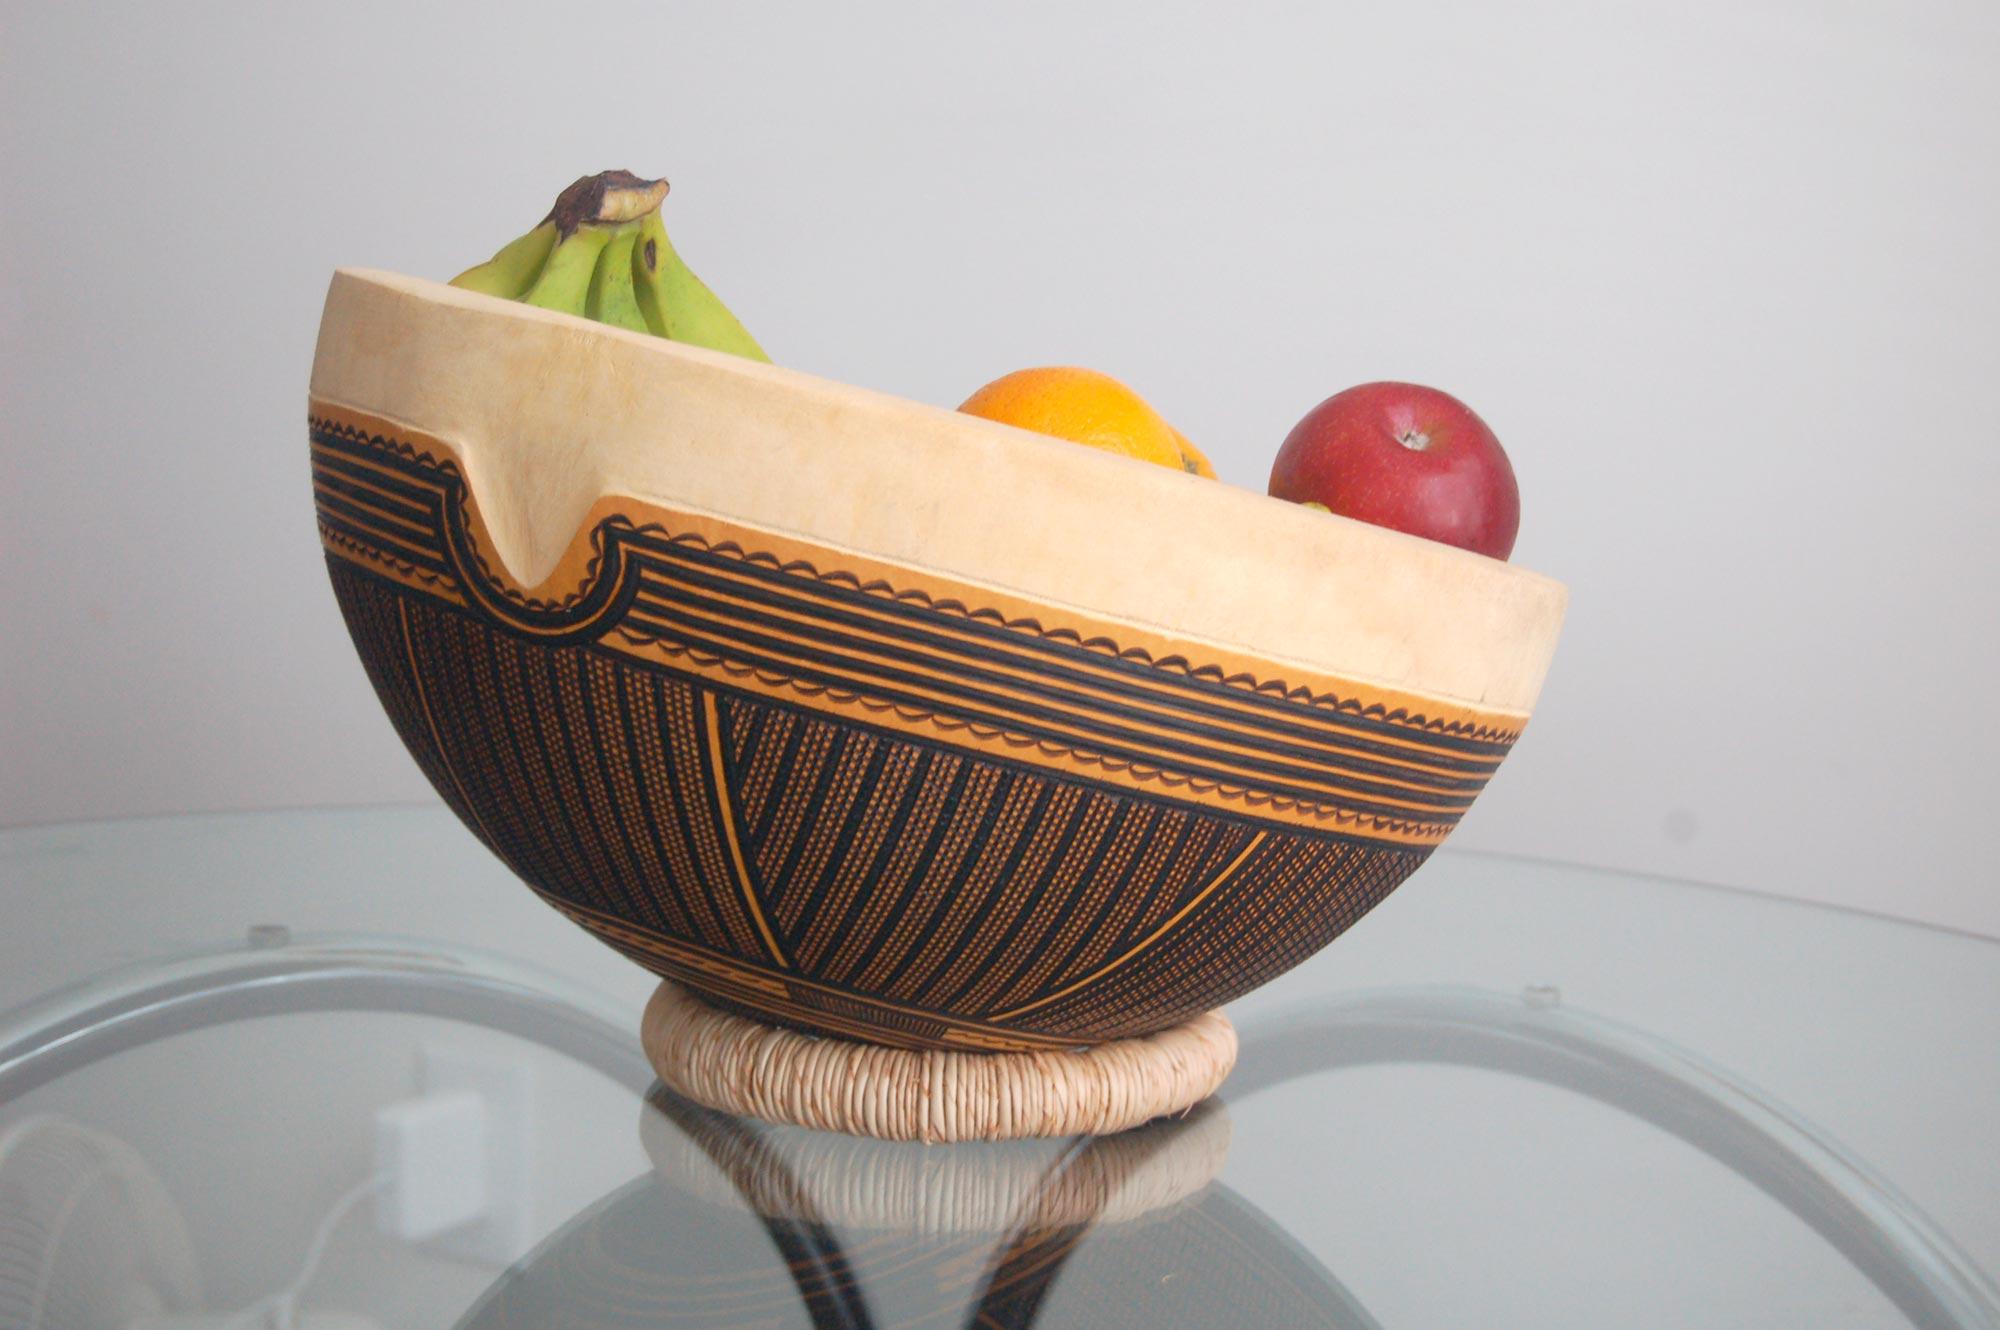 Gourd Art – Pyro-Etched Cross-Hatch